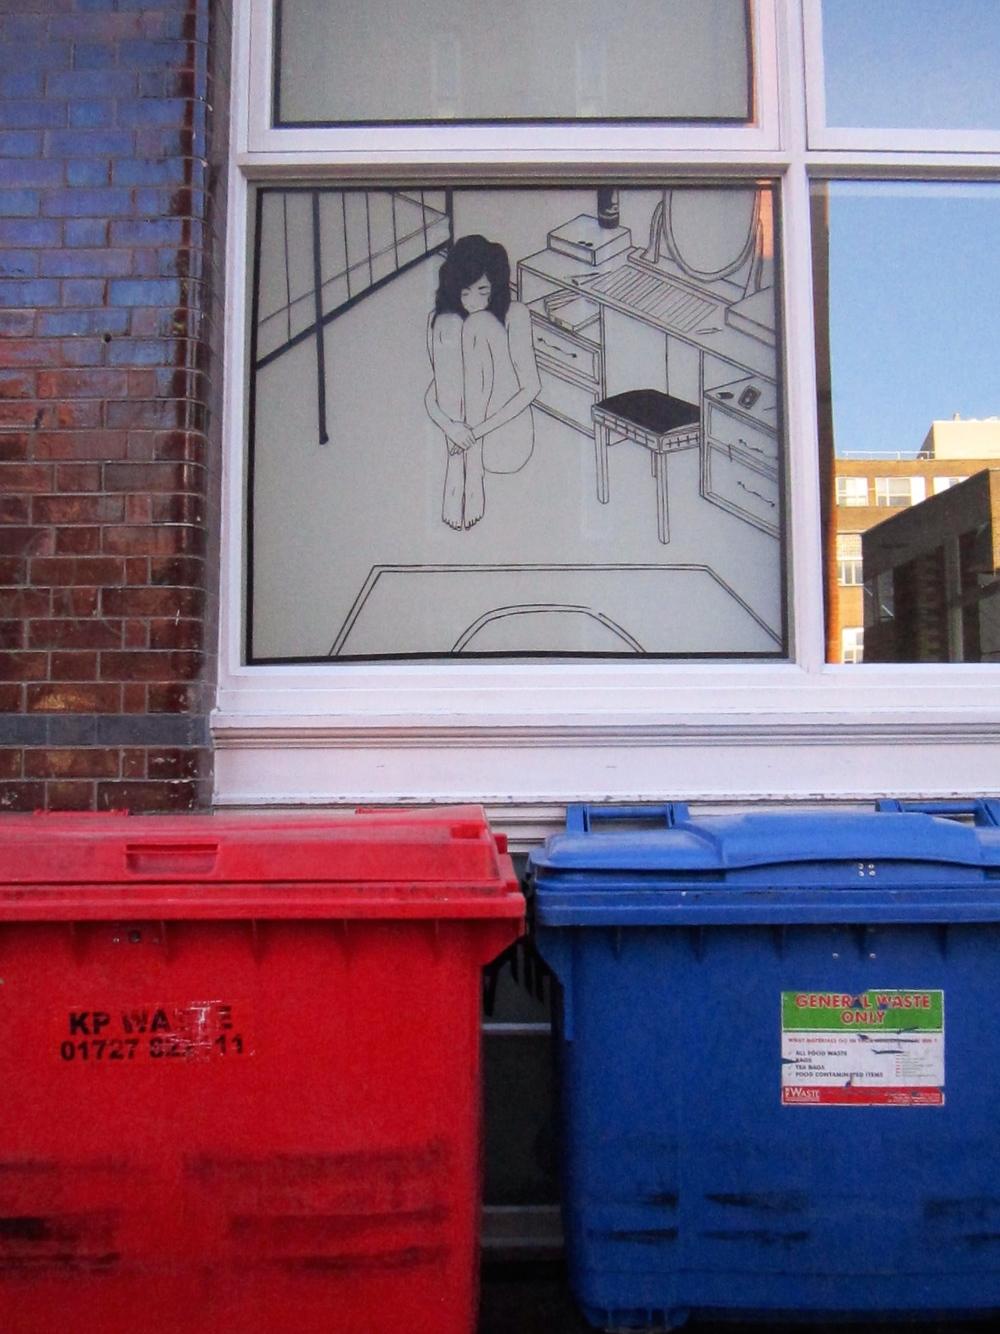 BENJAMIN MURPHY Tape Art in London Shoreditch